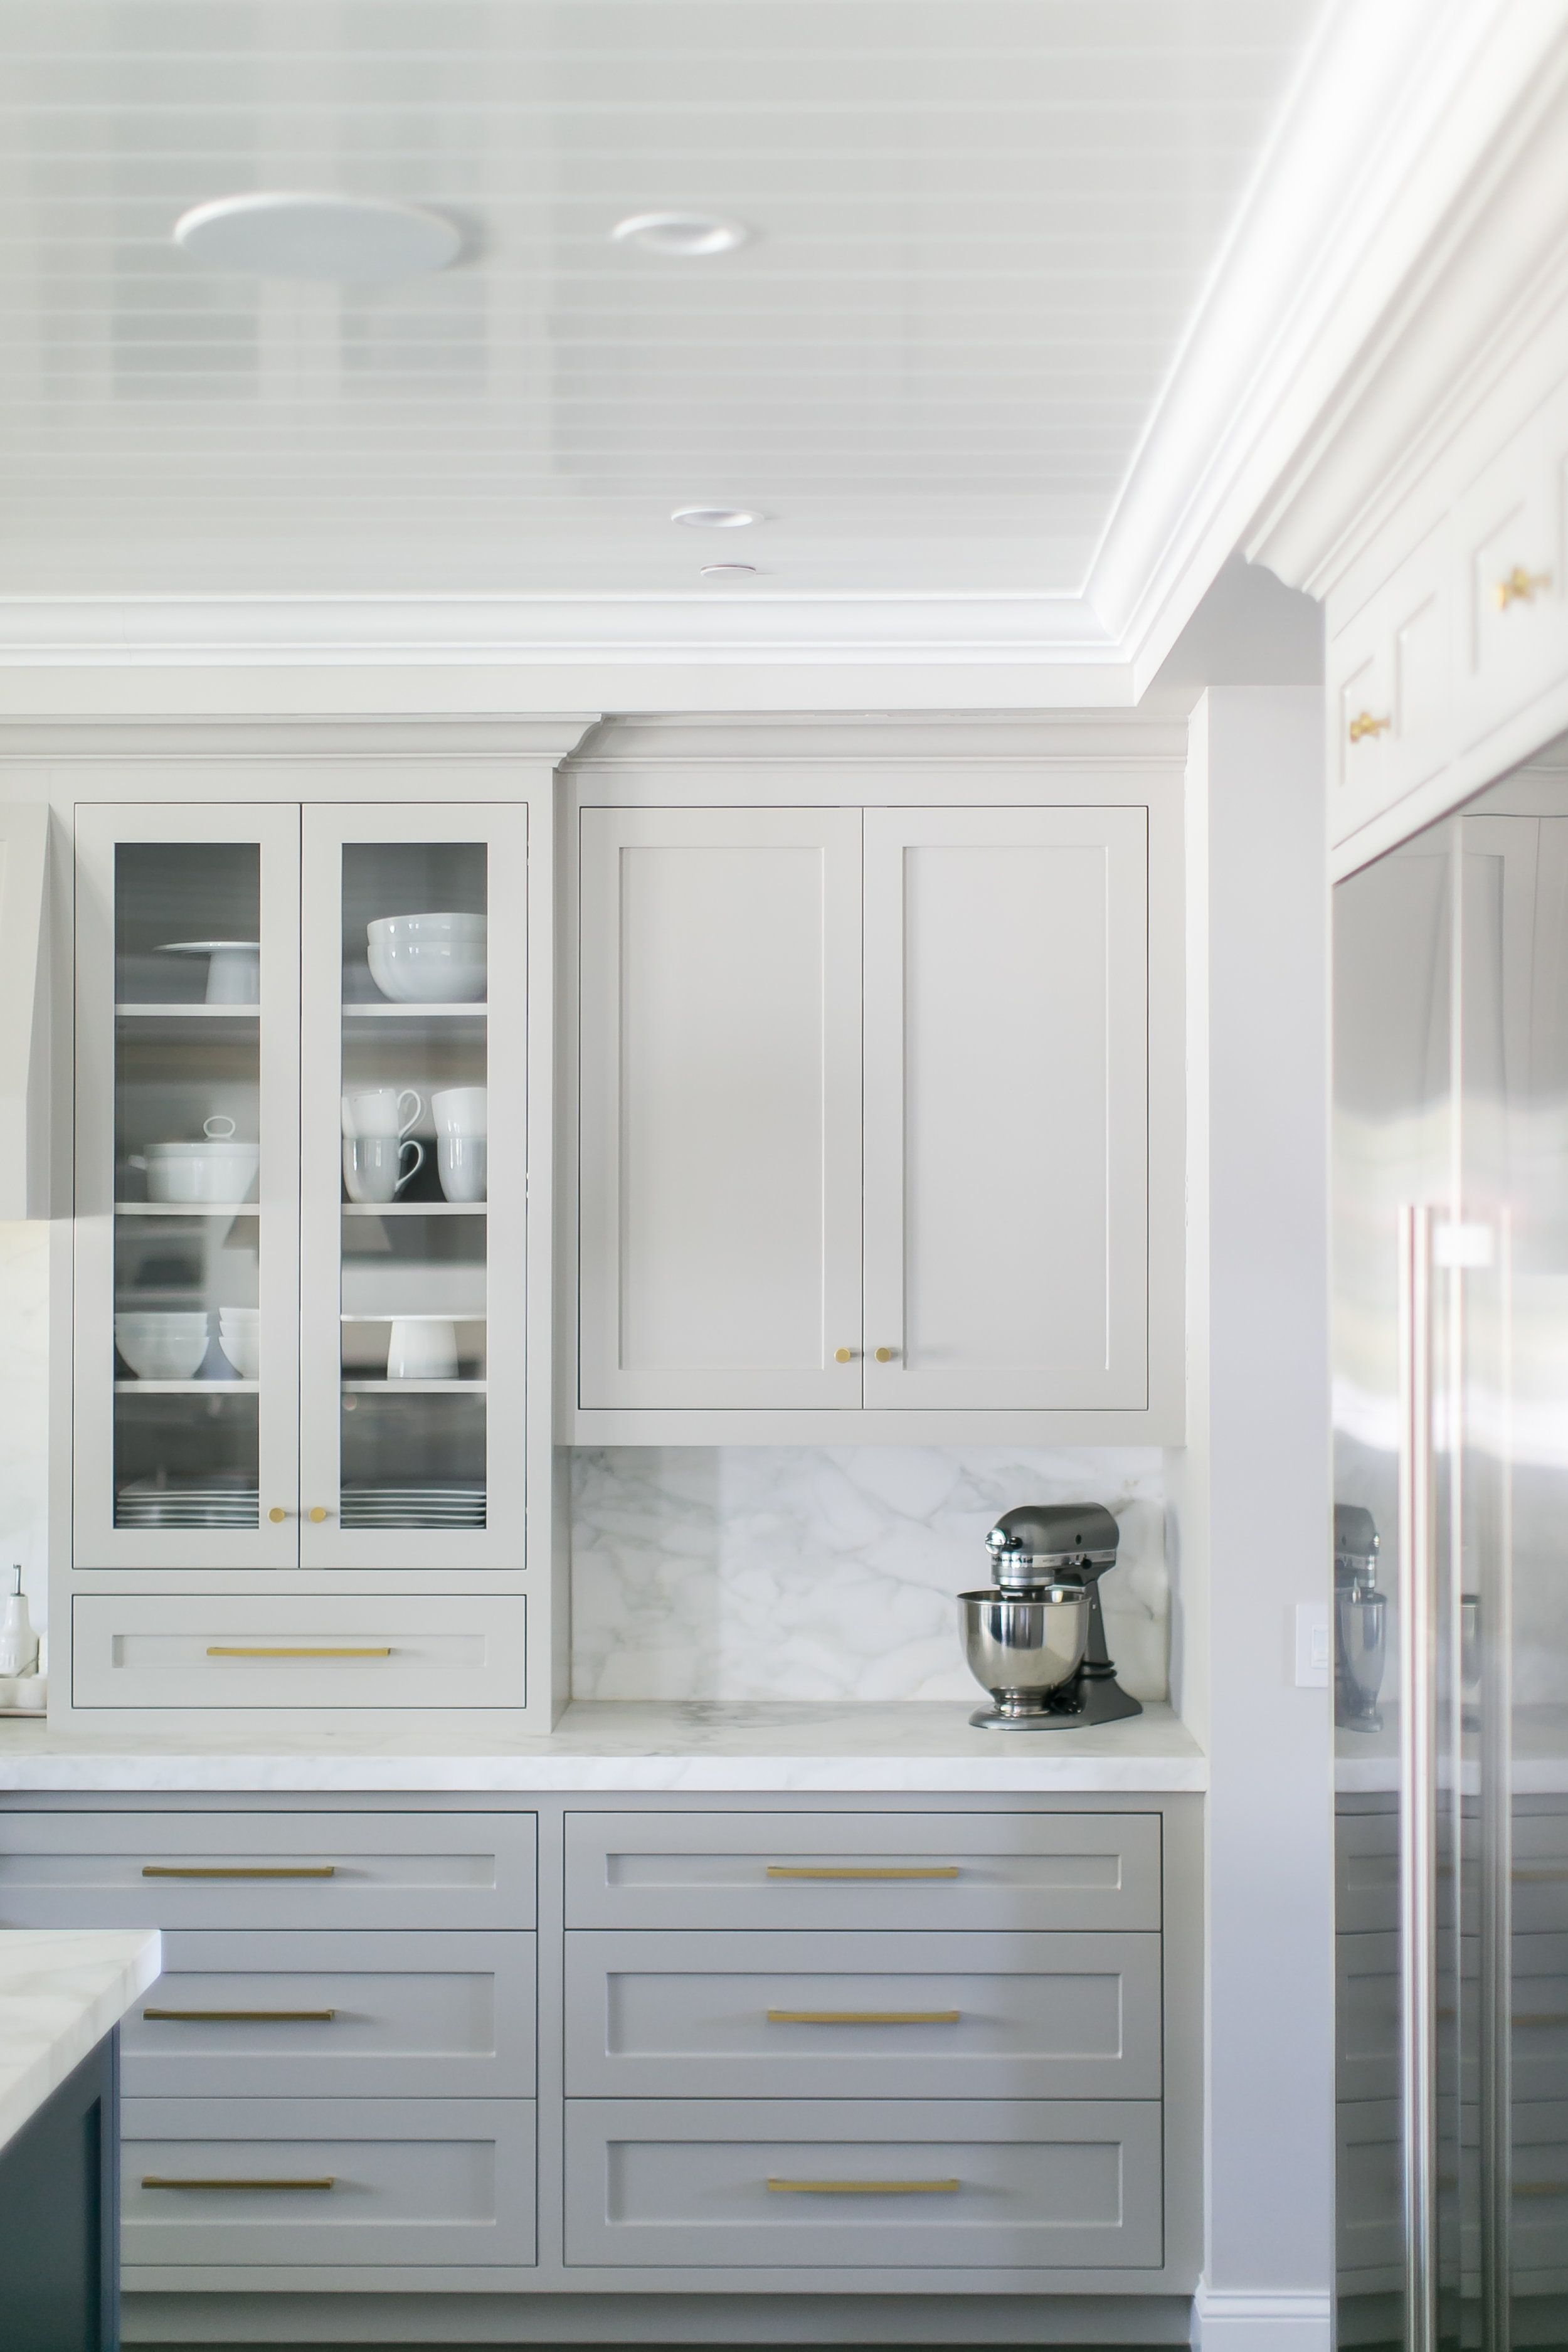 Gorgeous Light Grey Cabinets Marbled Countertops Backsplash